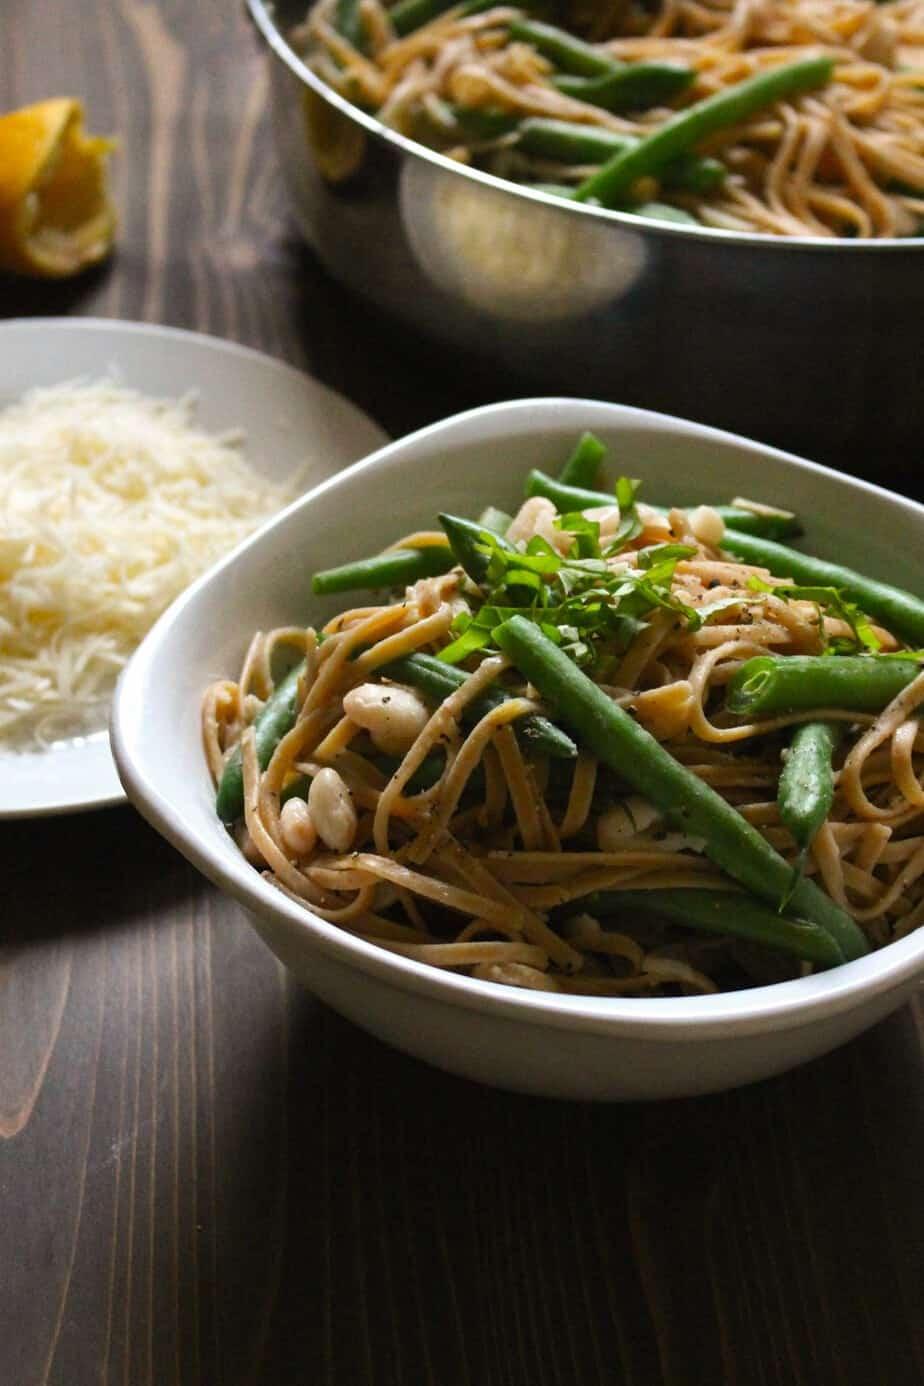 Lemon Garlic Linguine with Green Beans | FrugalNutrition